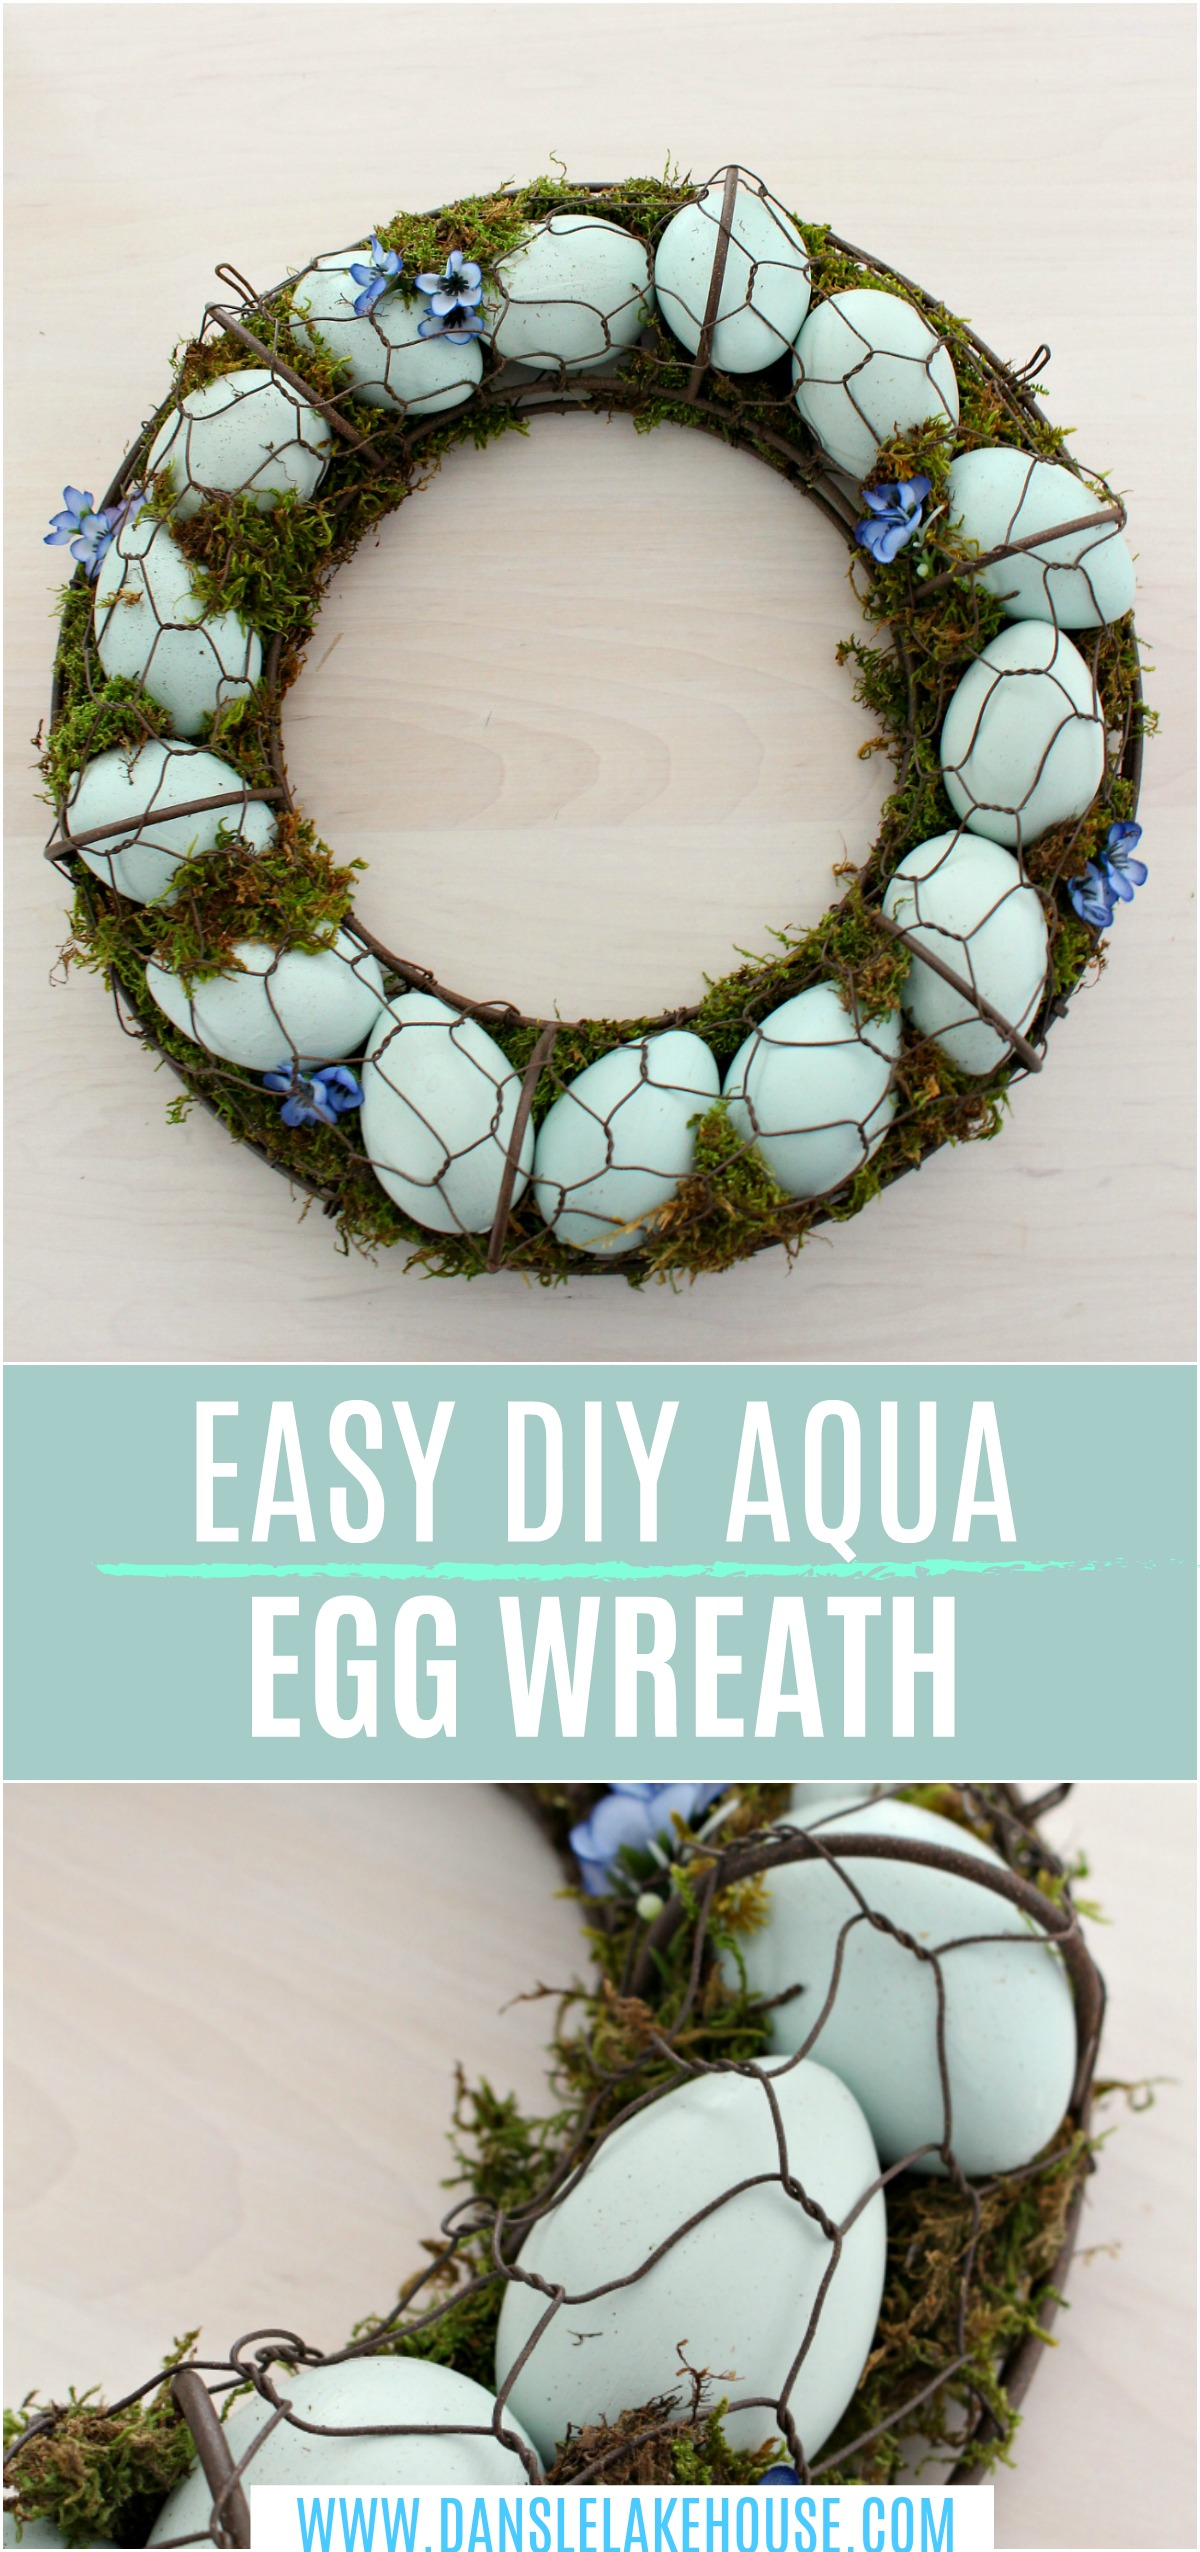 Easy DIY Aqua Egg Wreath